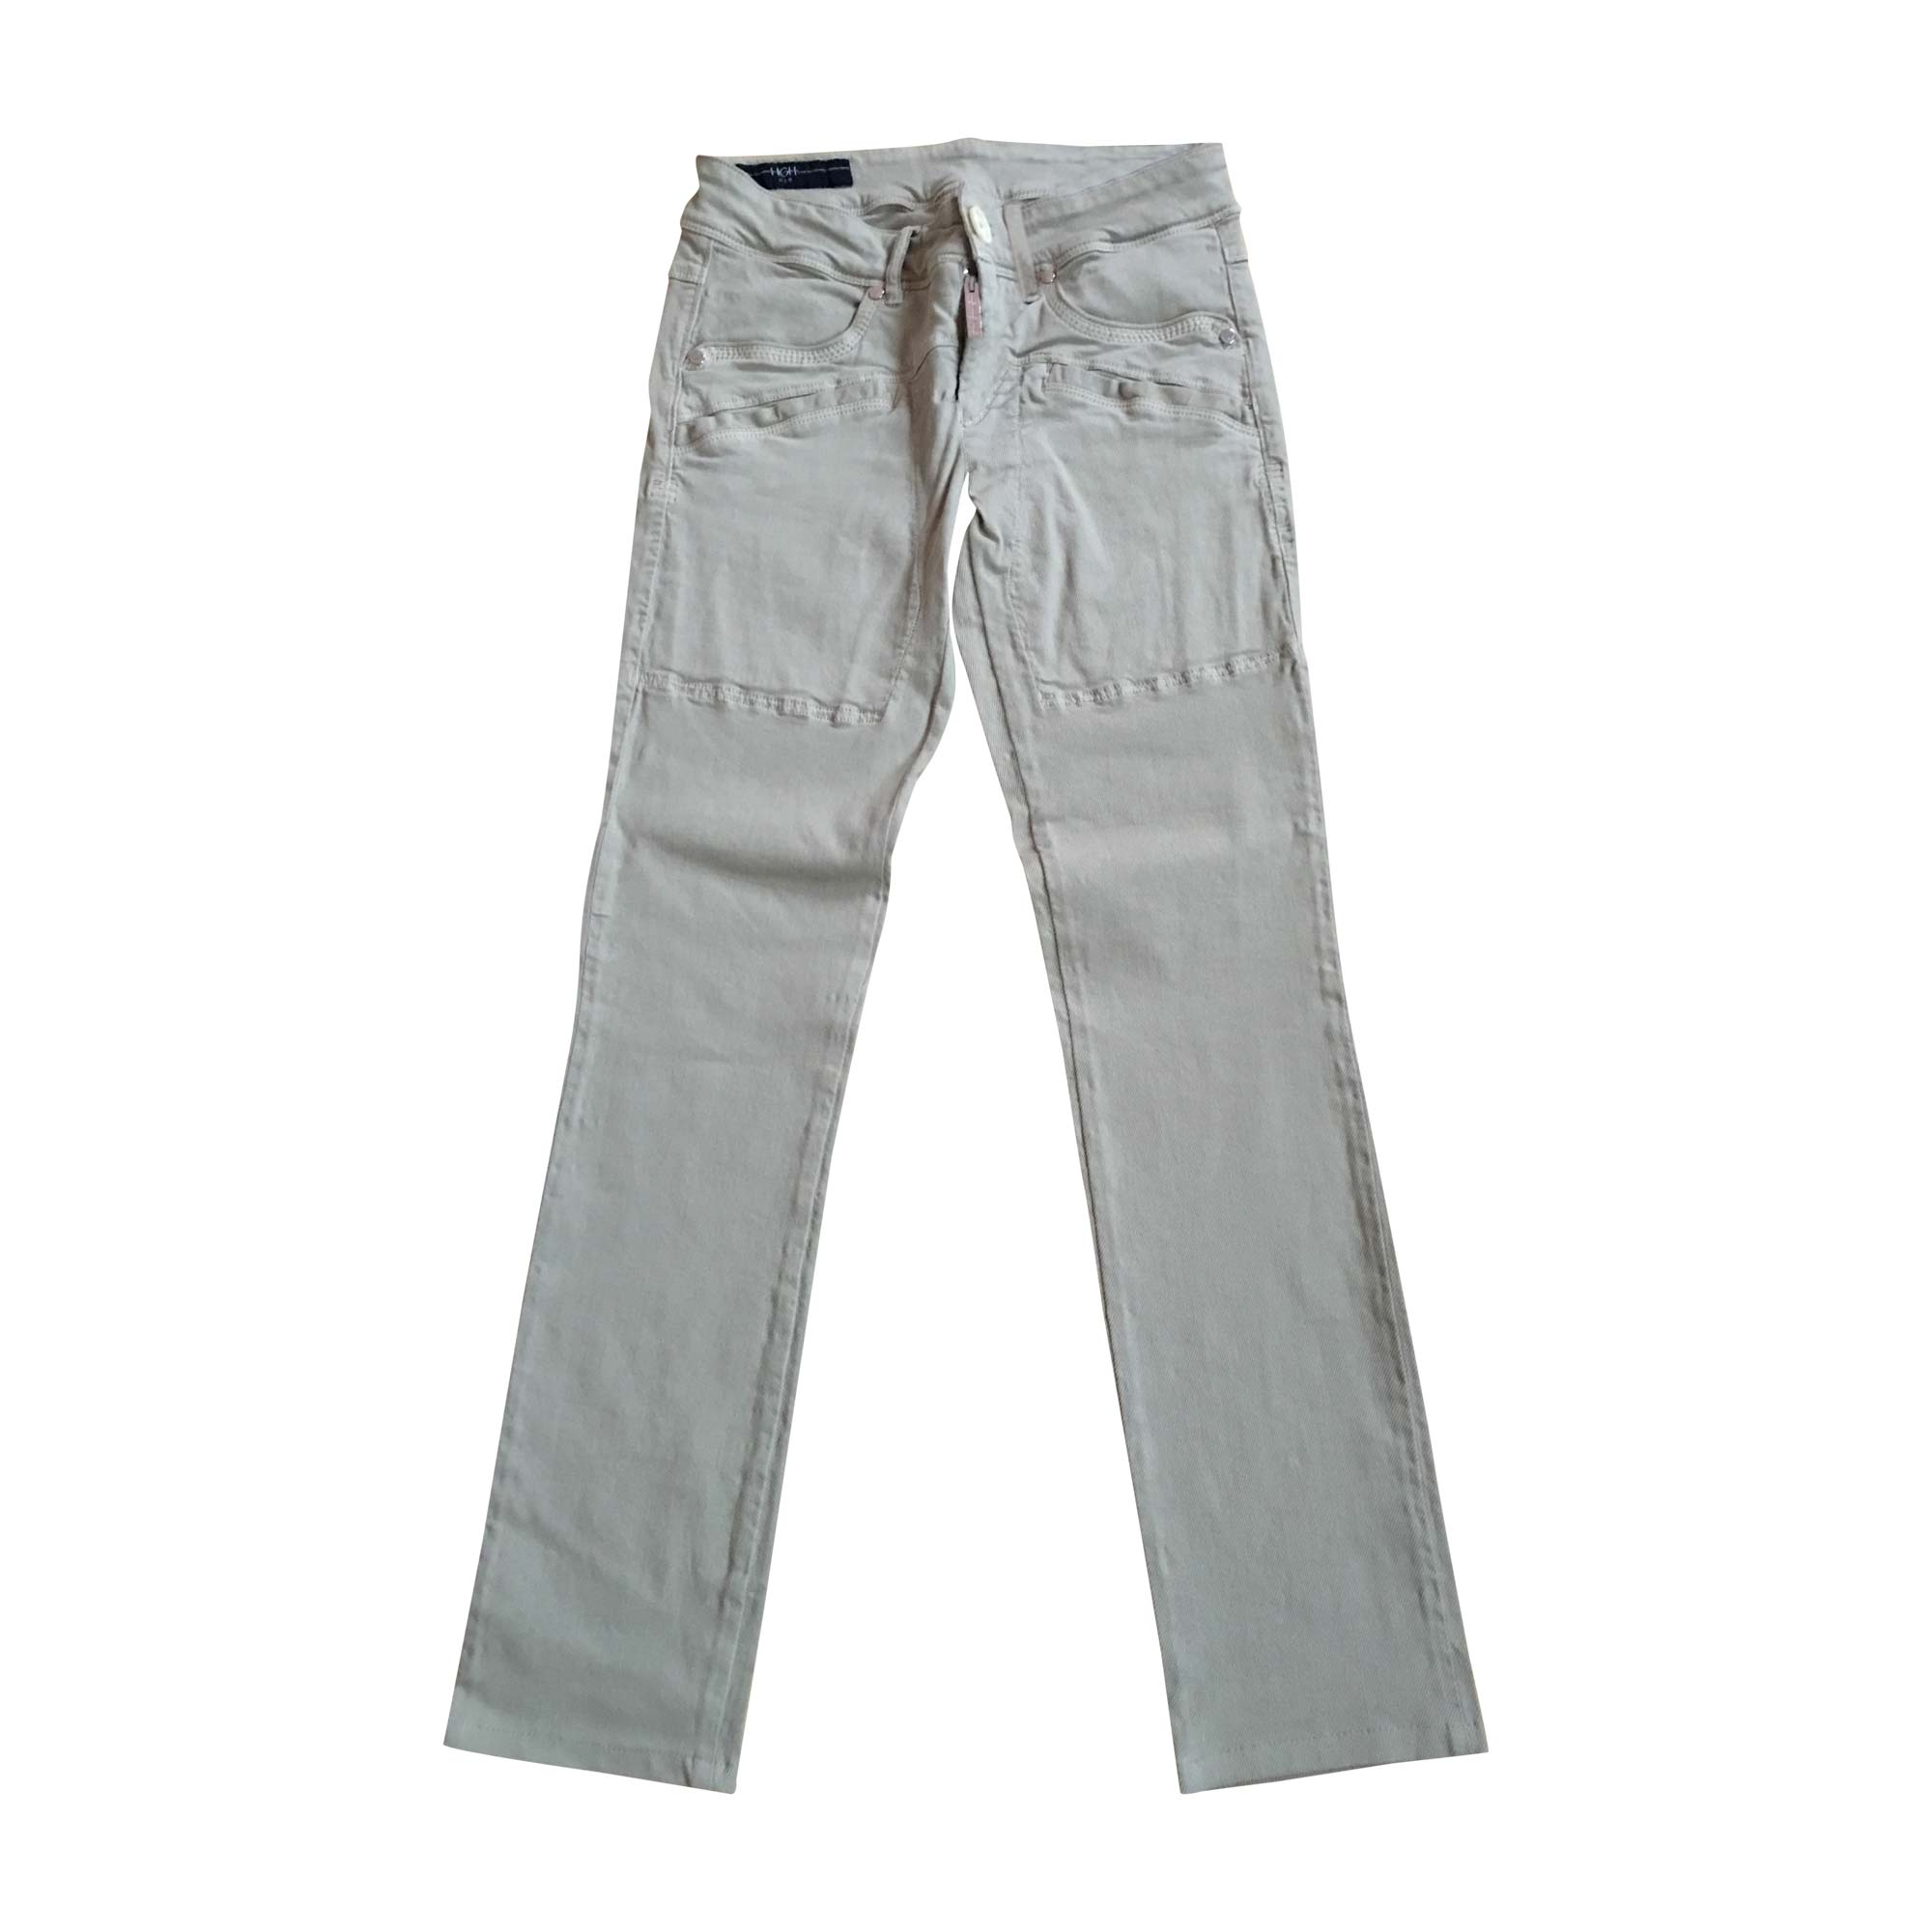 Pantalon droit HIGH Beige, camel